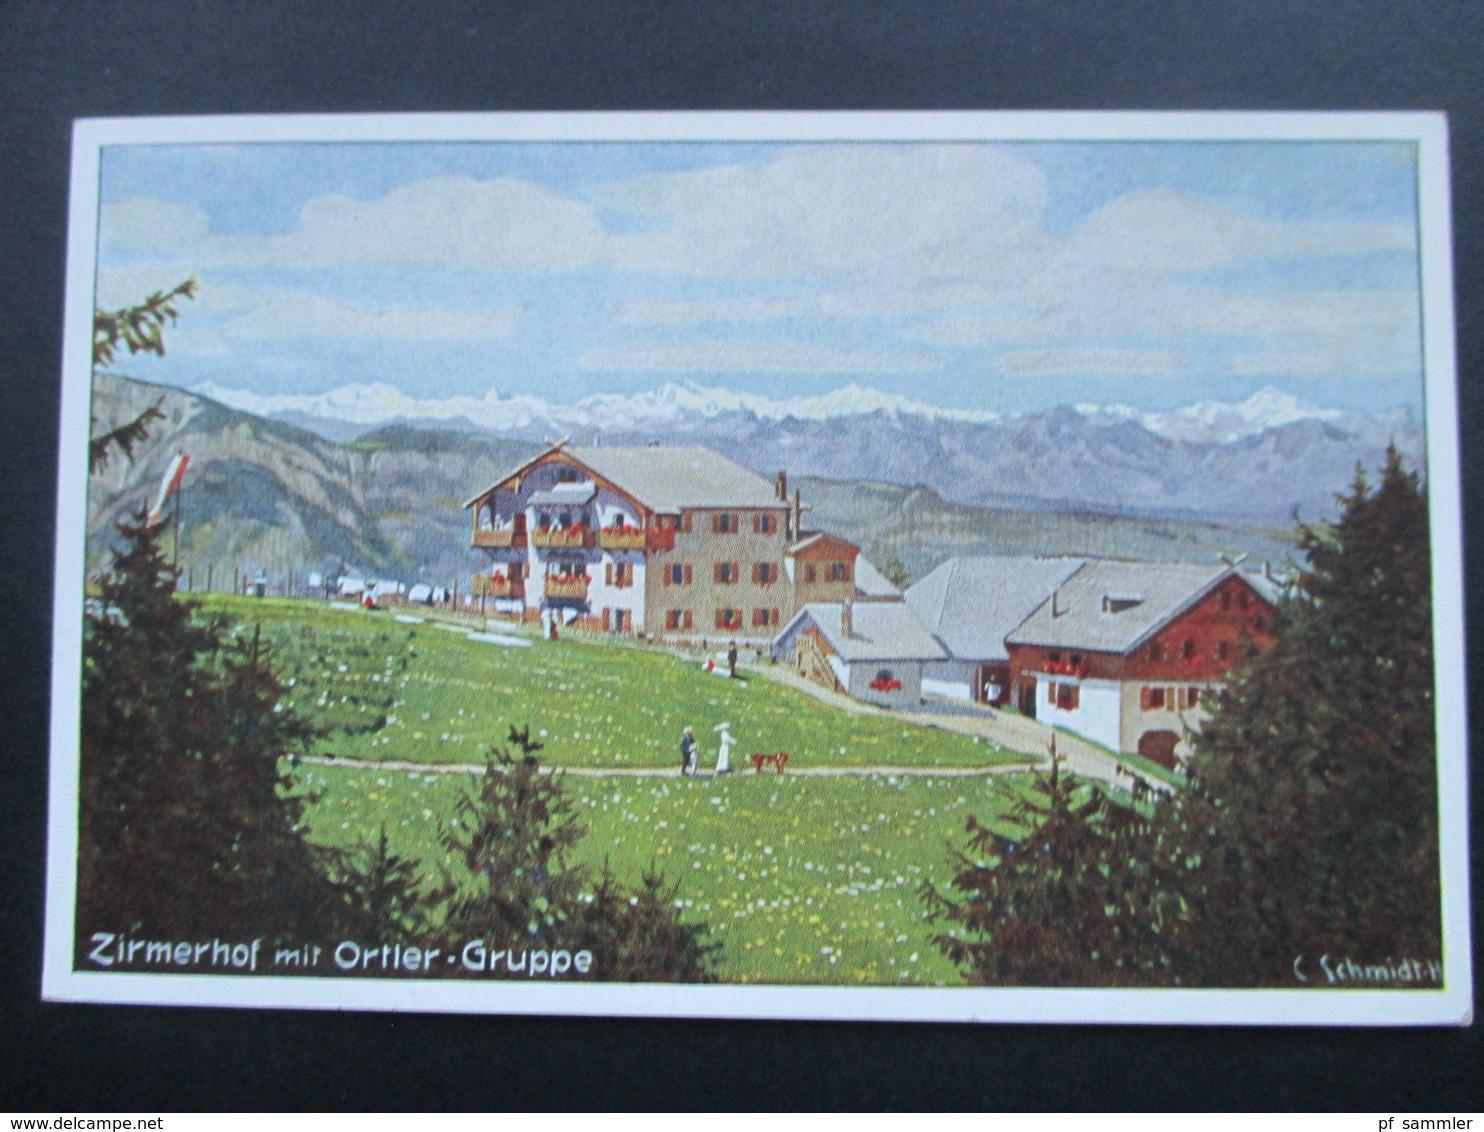 Südtirol Künstlerkarte C. Schmidt-H. Zirmerhof Mit Ortler Gruppe. Pensione Perwanger Zirmer Posta Fontane Fredde. - Hotels & Gaststätten